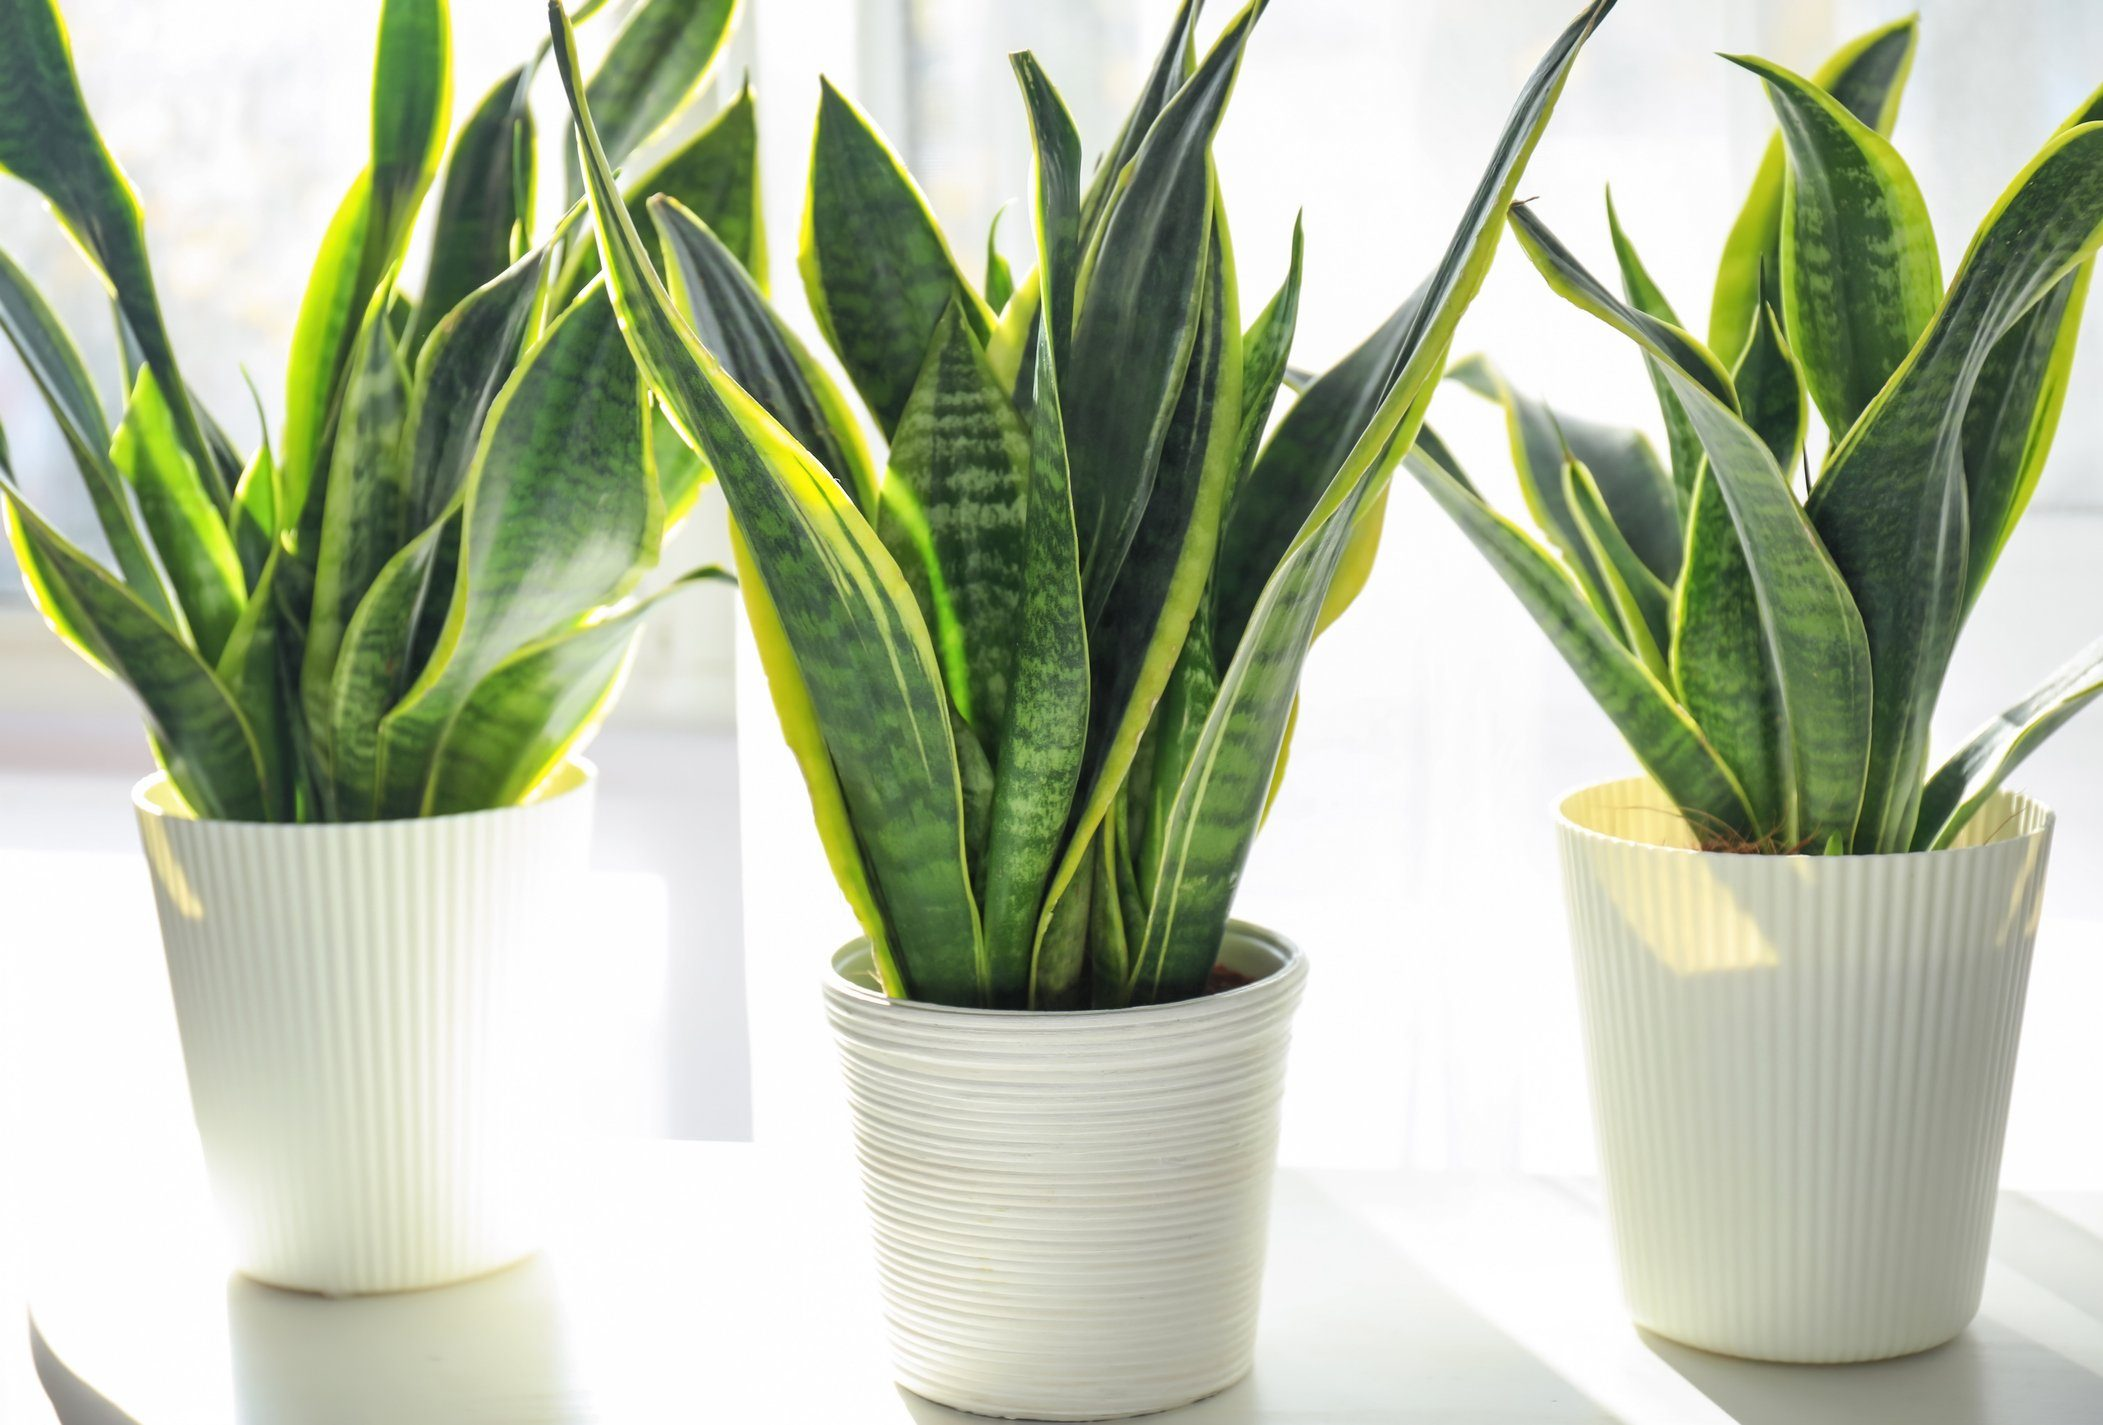 Decorative sansevieria plants on white table